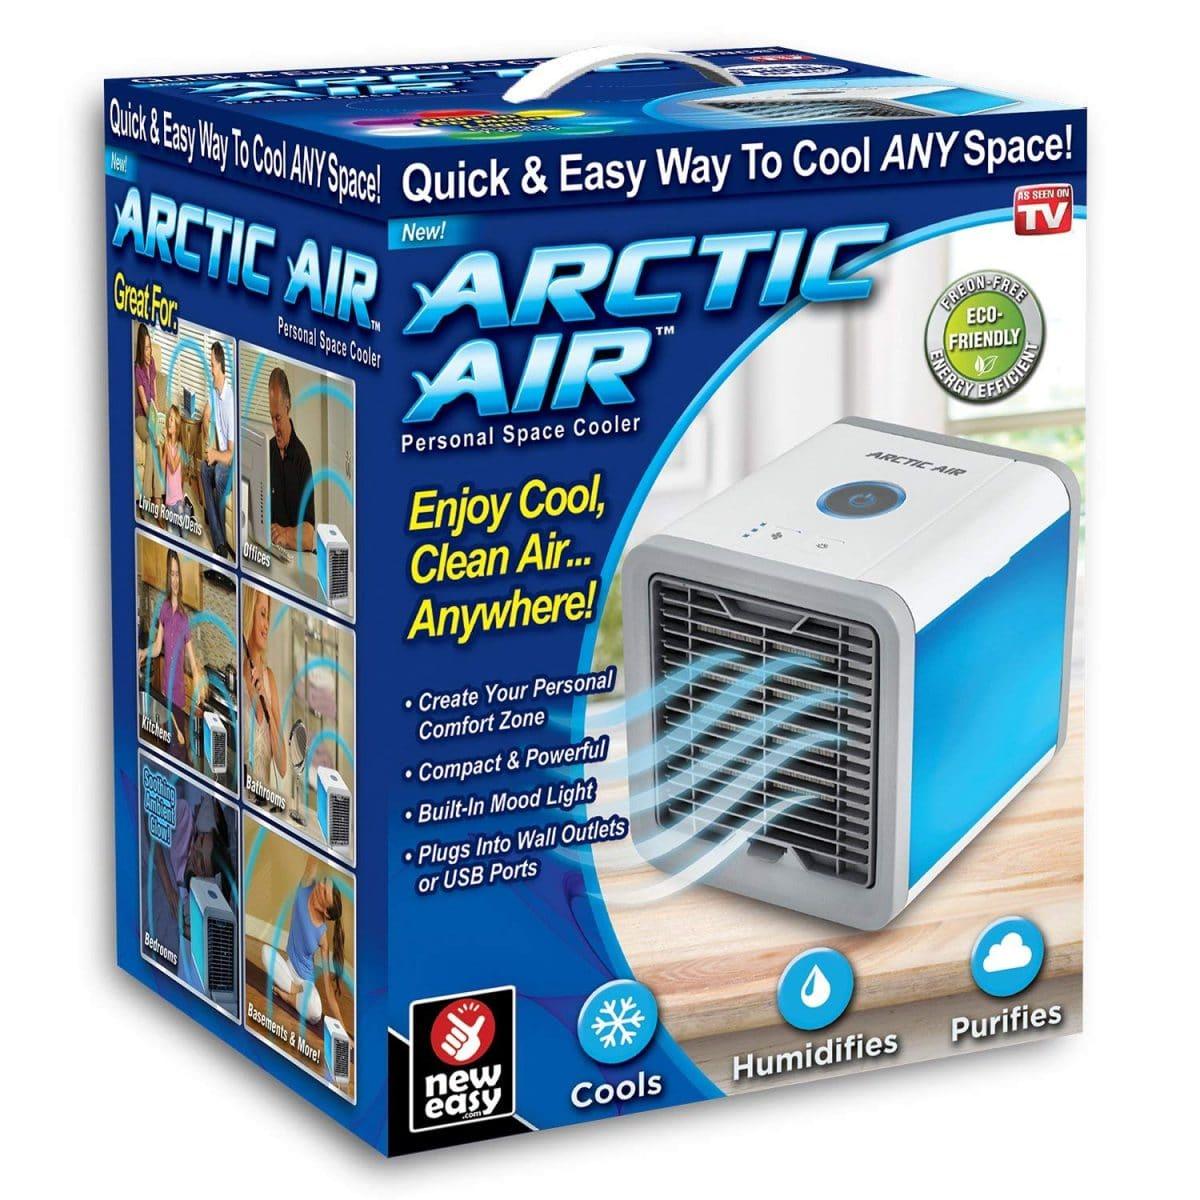 Best Cheap Portable Air Conditioner 2020 Under 150 300 Budgetreport